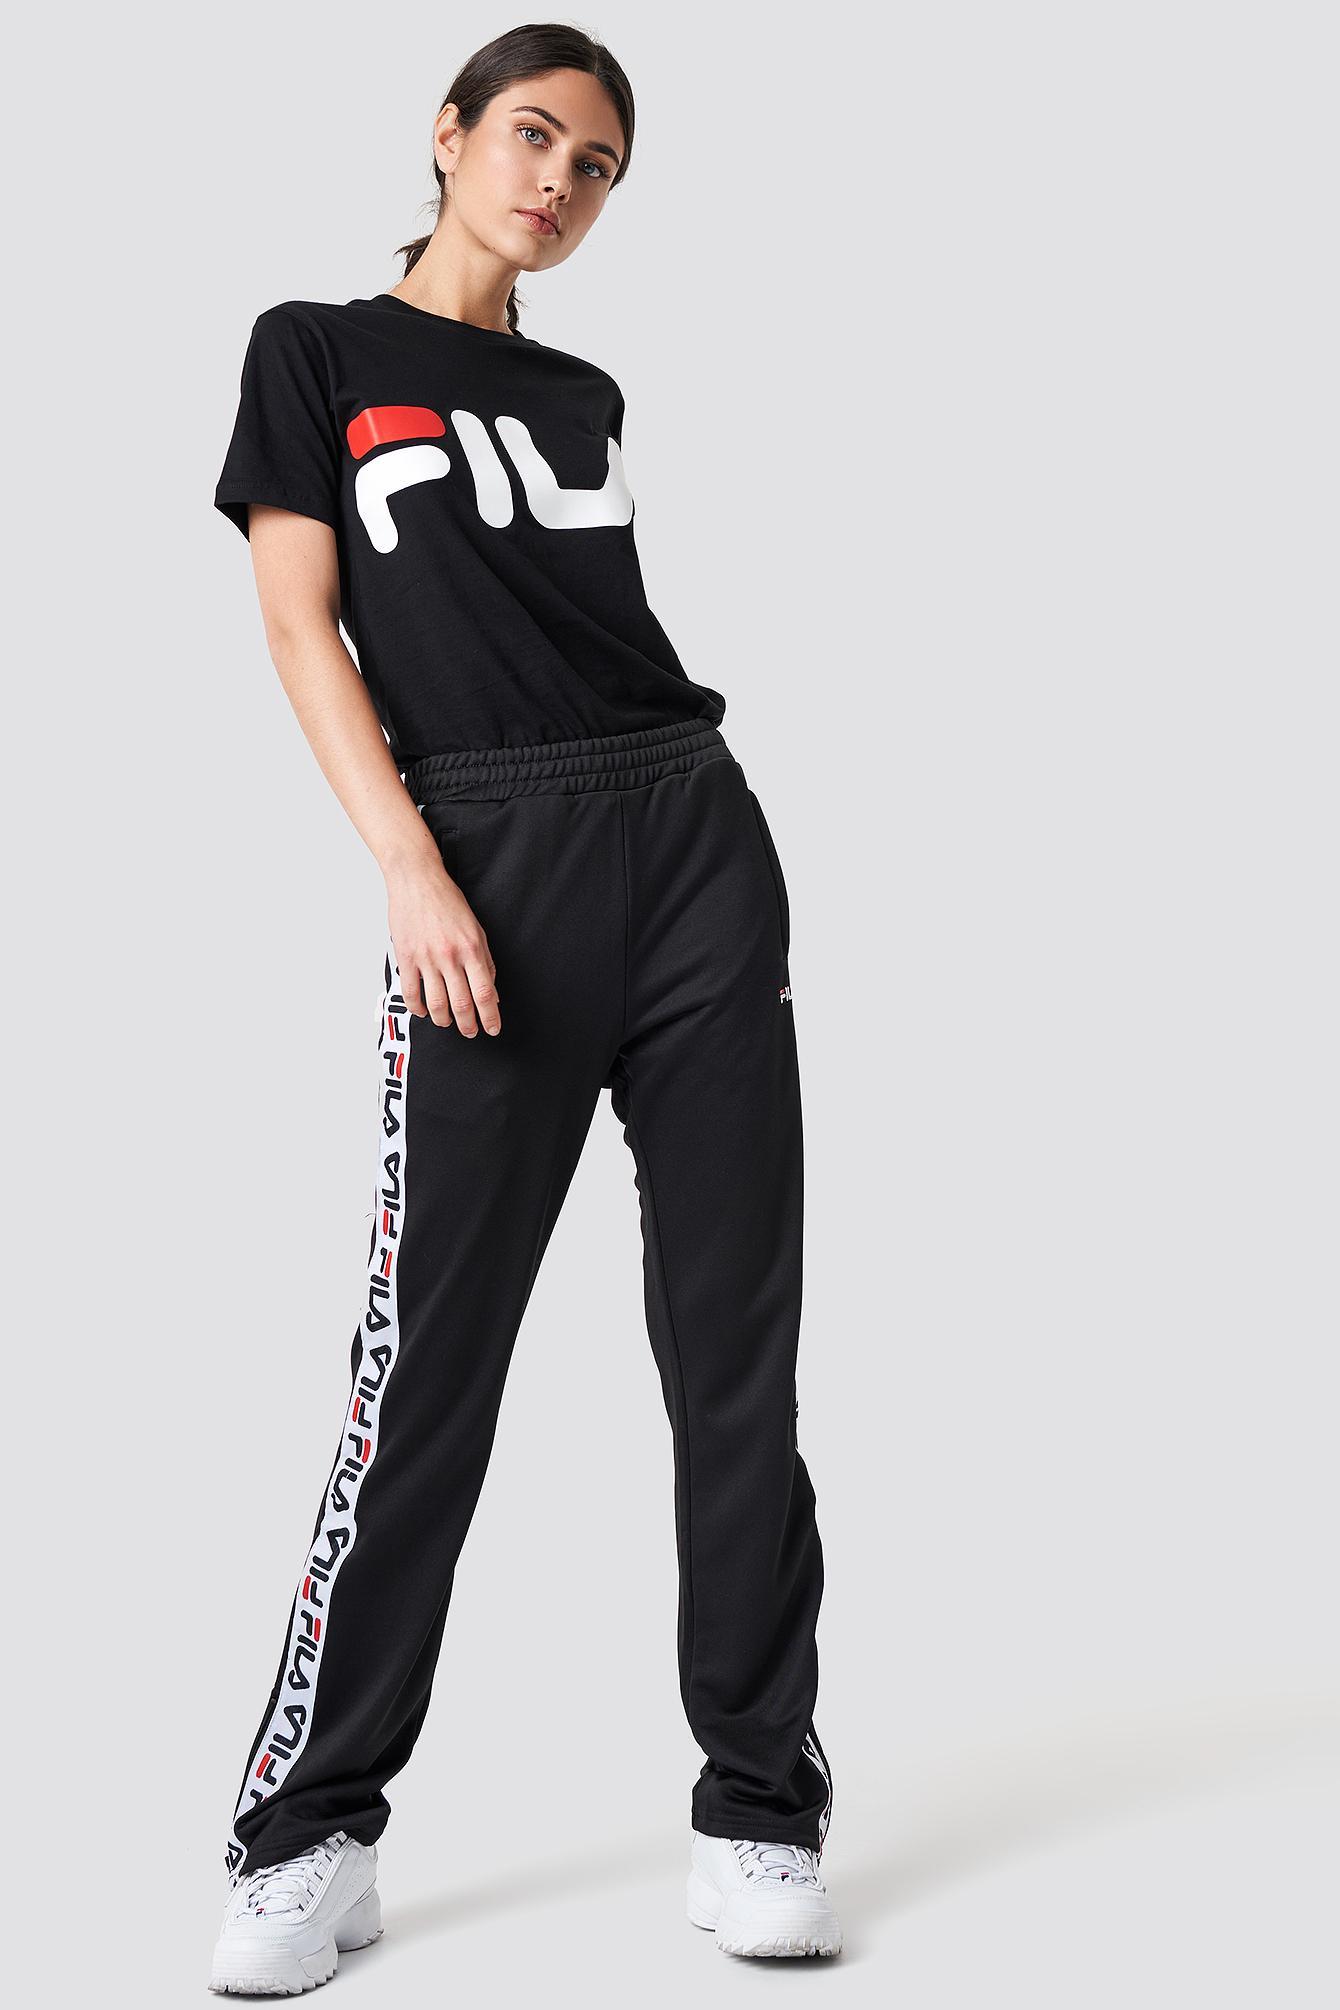 Fila Thora Track Pants - Black